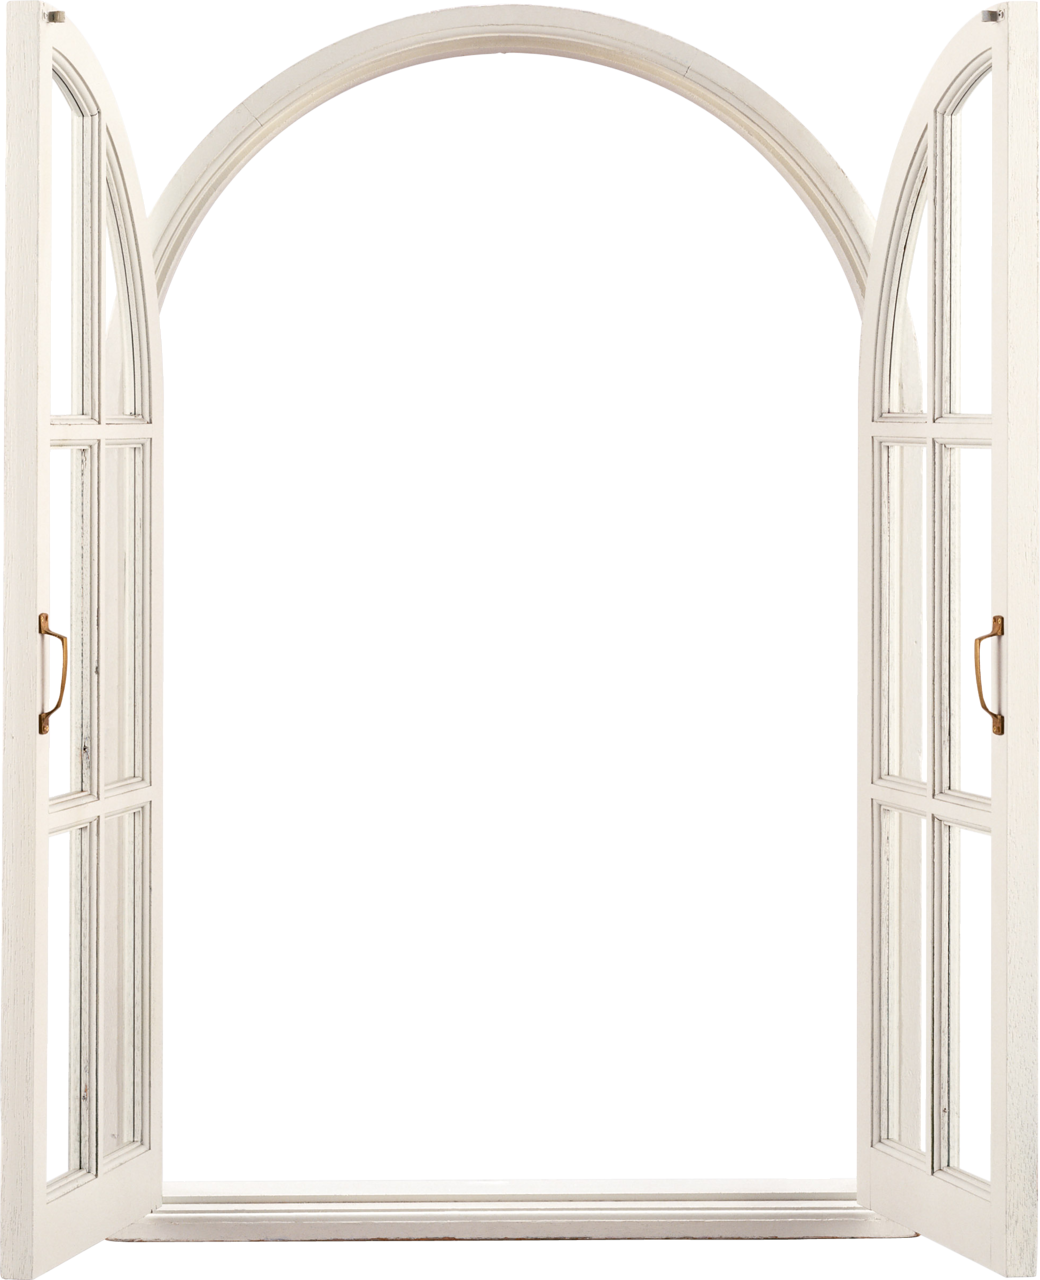 Ms minikit frame png. Win clipart window border